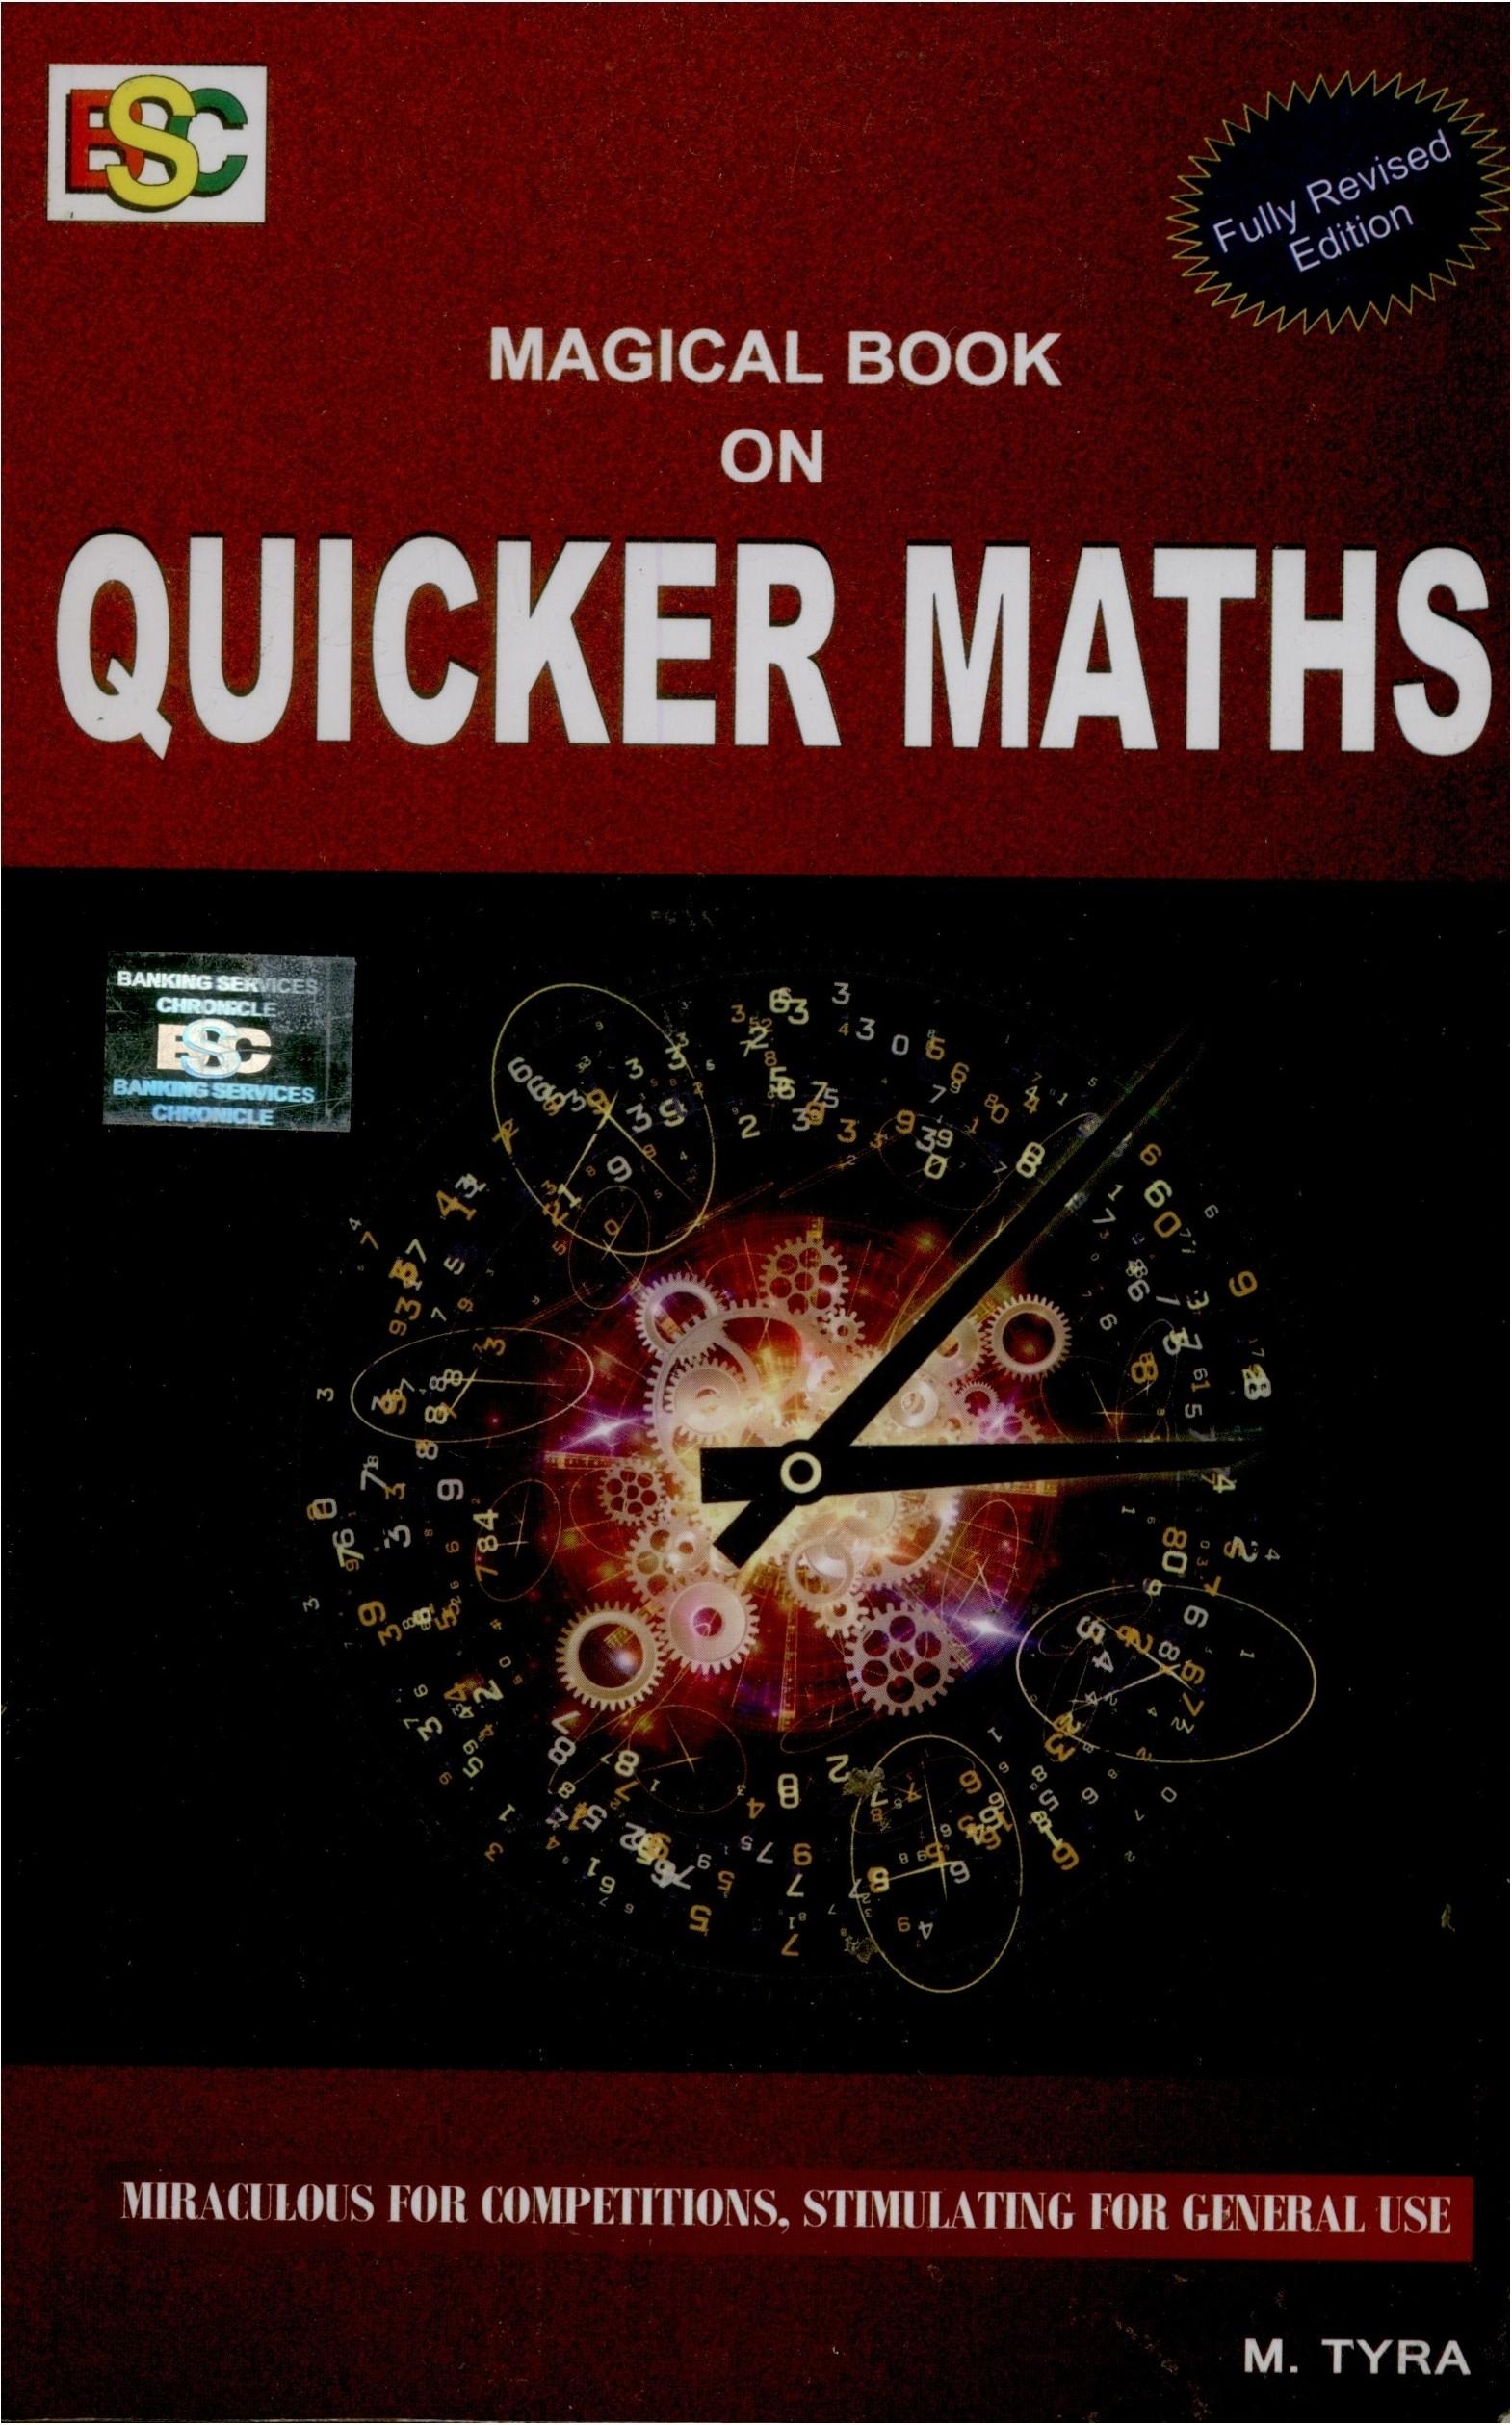 Ap Math Books Magical Book On Quicker Maths Original Imadmcstcyggxnf